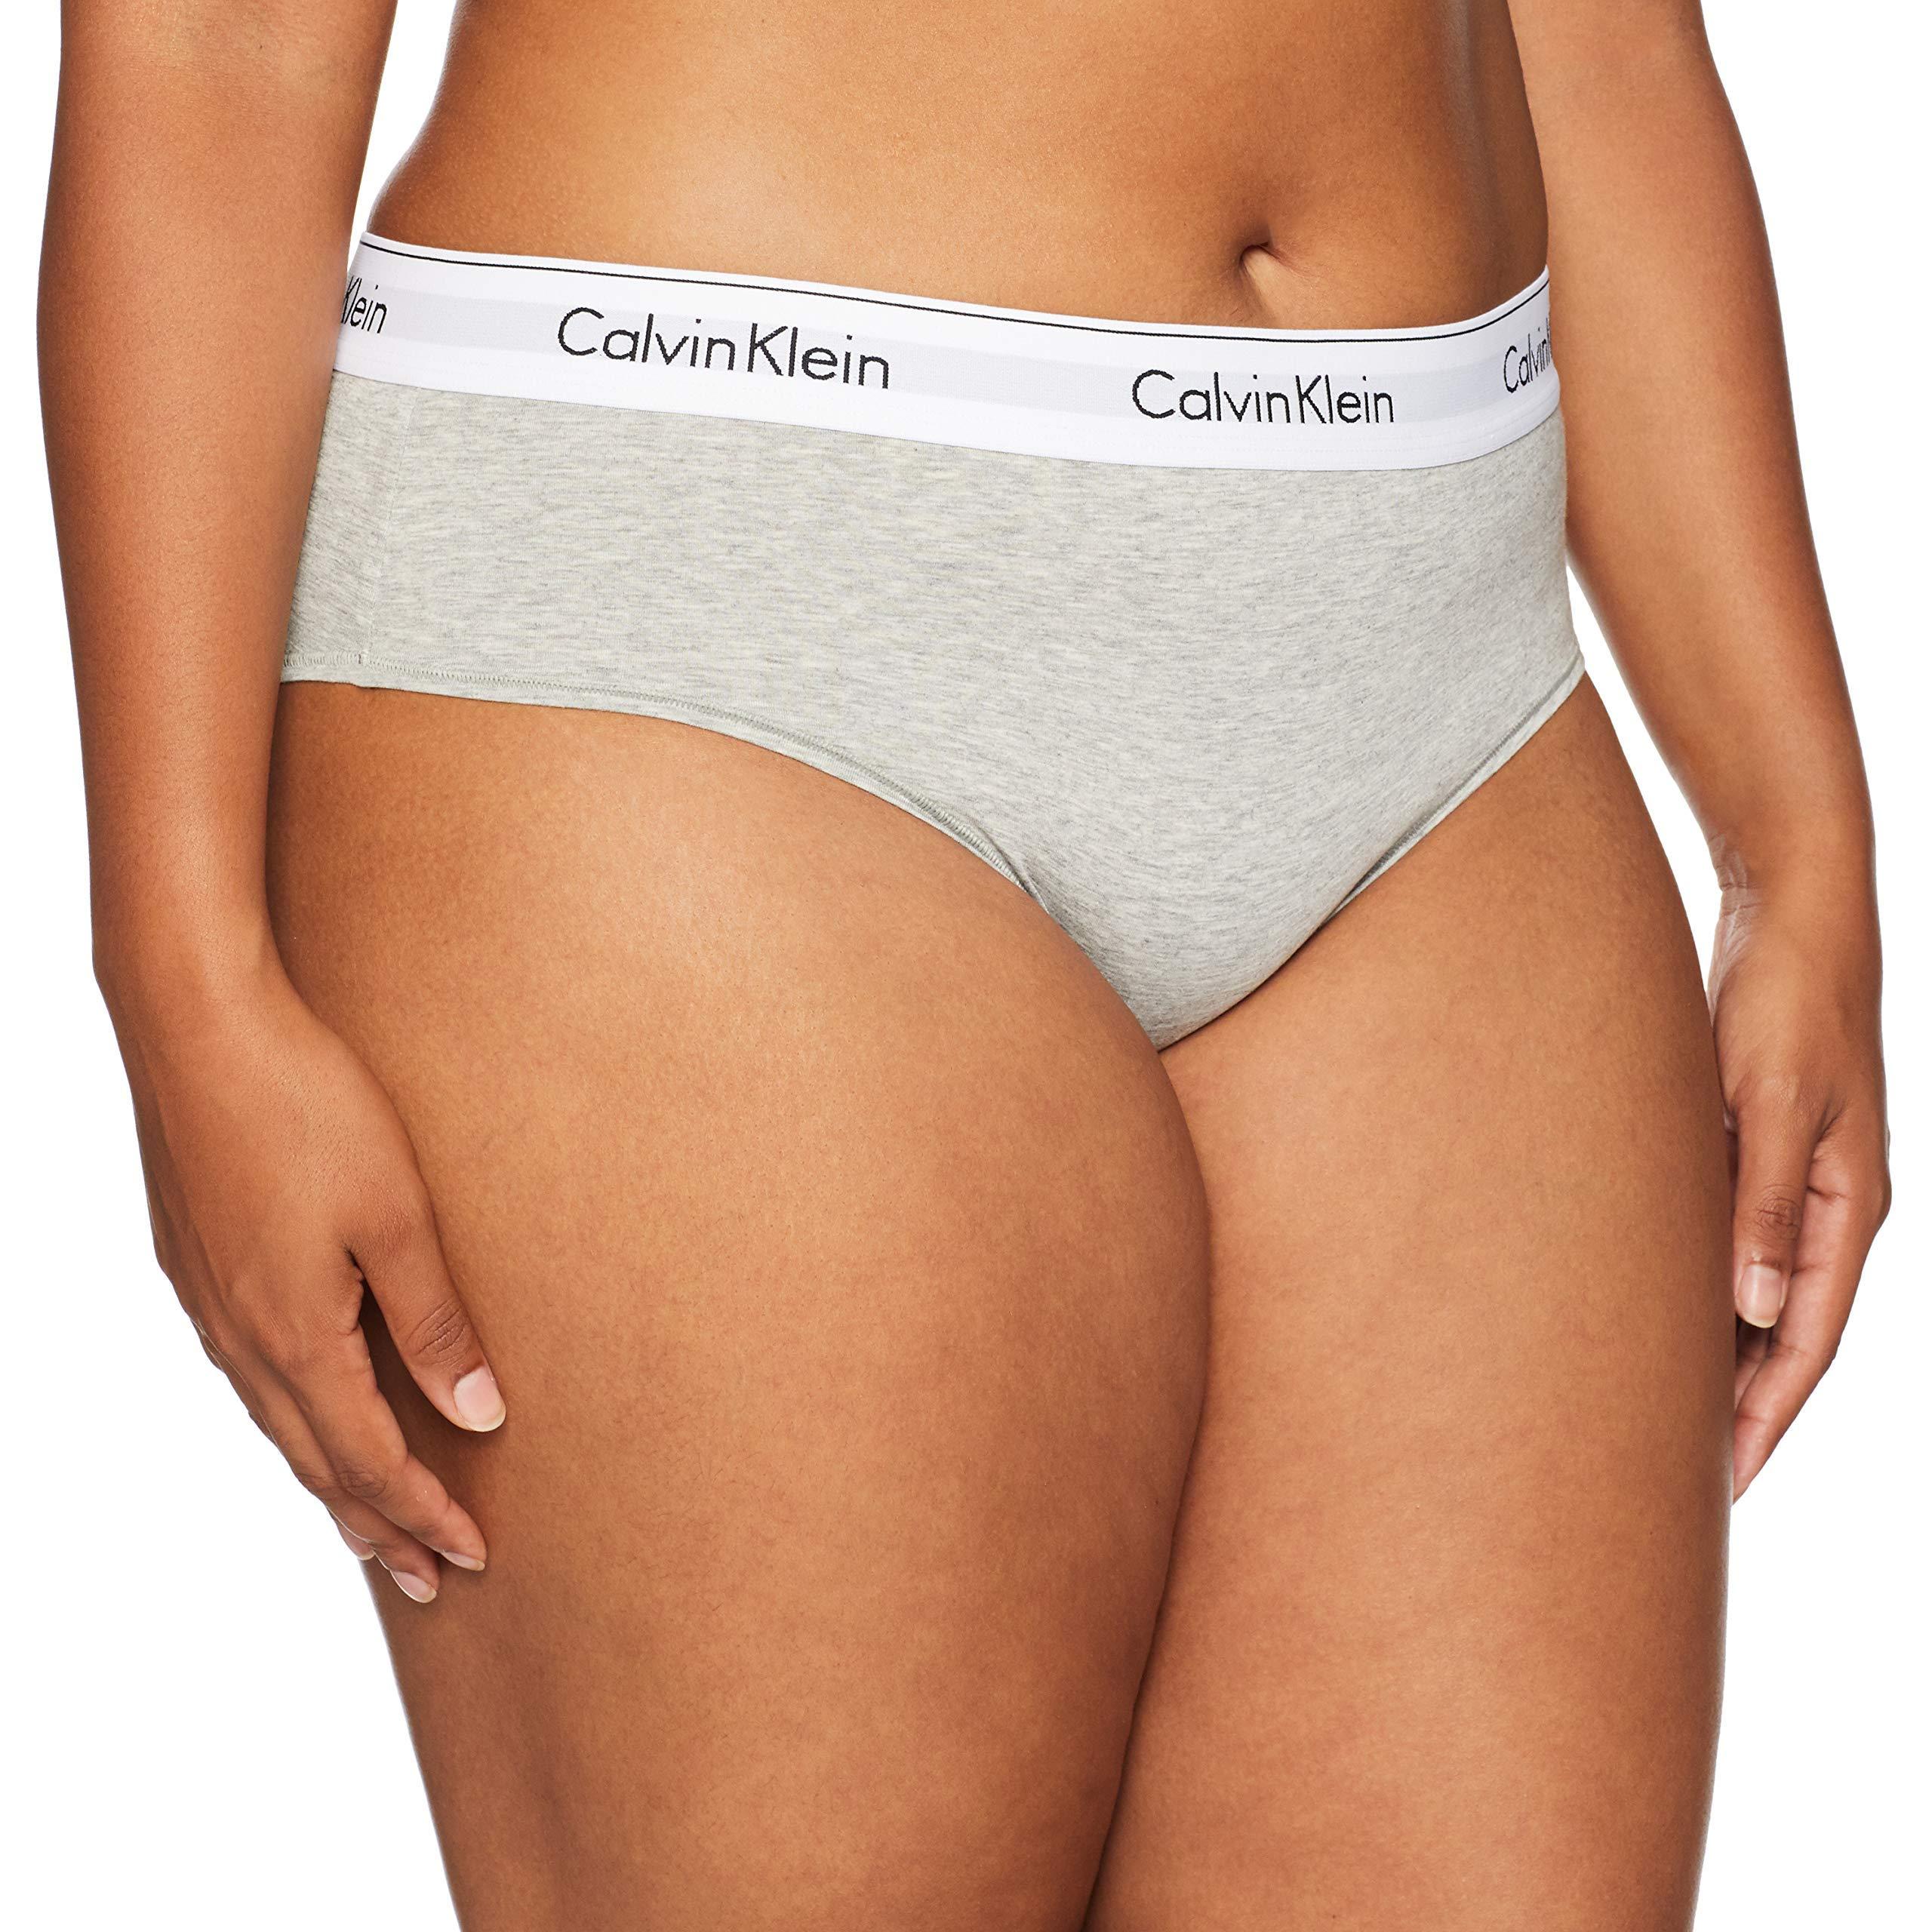 33167b5c1d312 Galleon - Calvin Klein Women s Modern Cotton Bikini